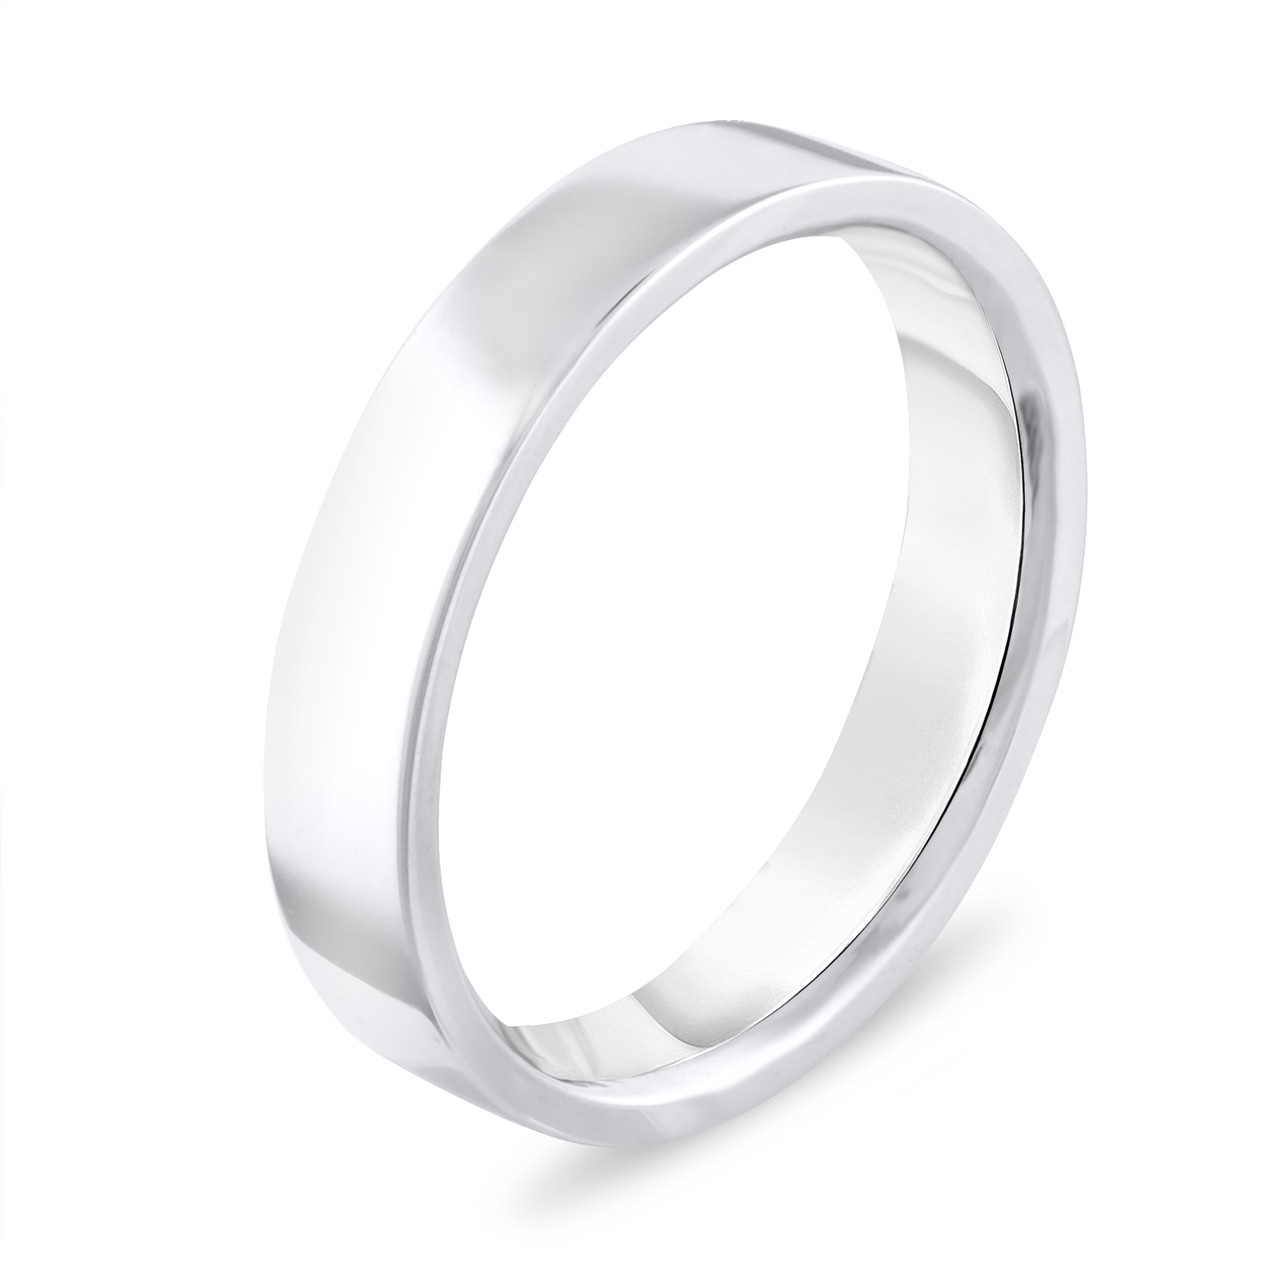 Wedding Band Men.4 Mm Wedding Band Flat Wedding Ring Wedding Band Mens Wedding Band Anniversary Band 14k White Gold Handmade